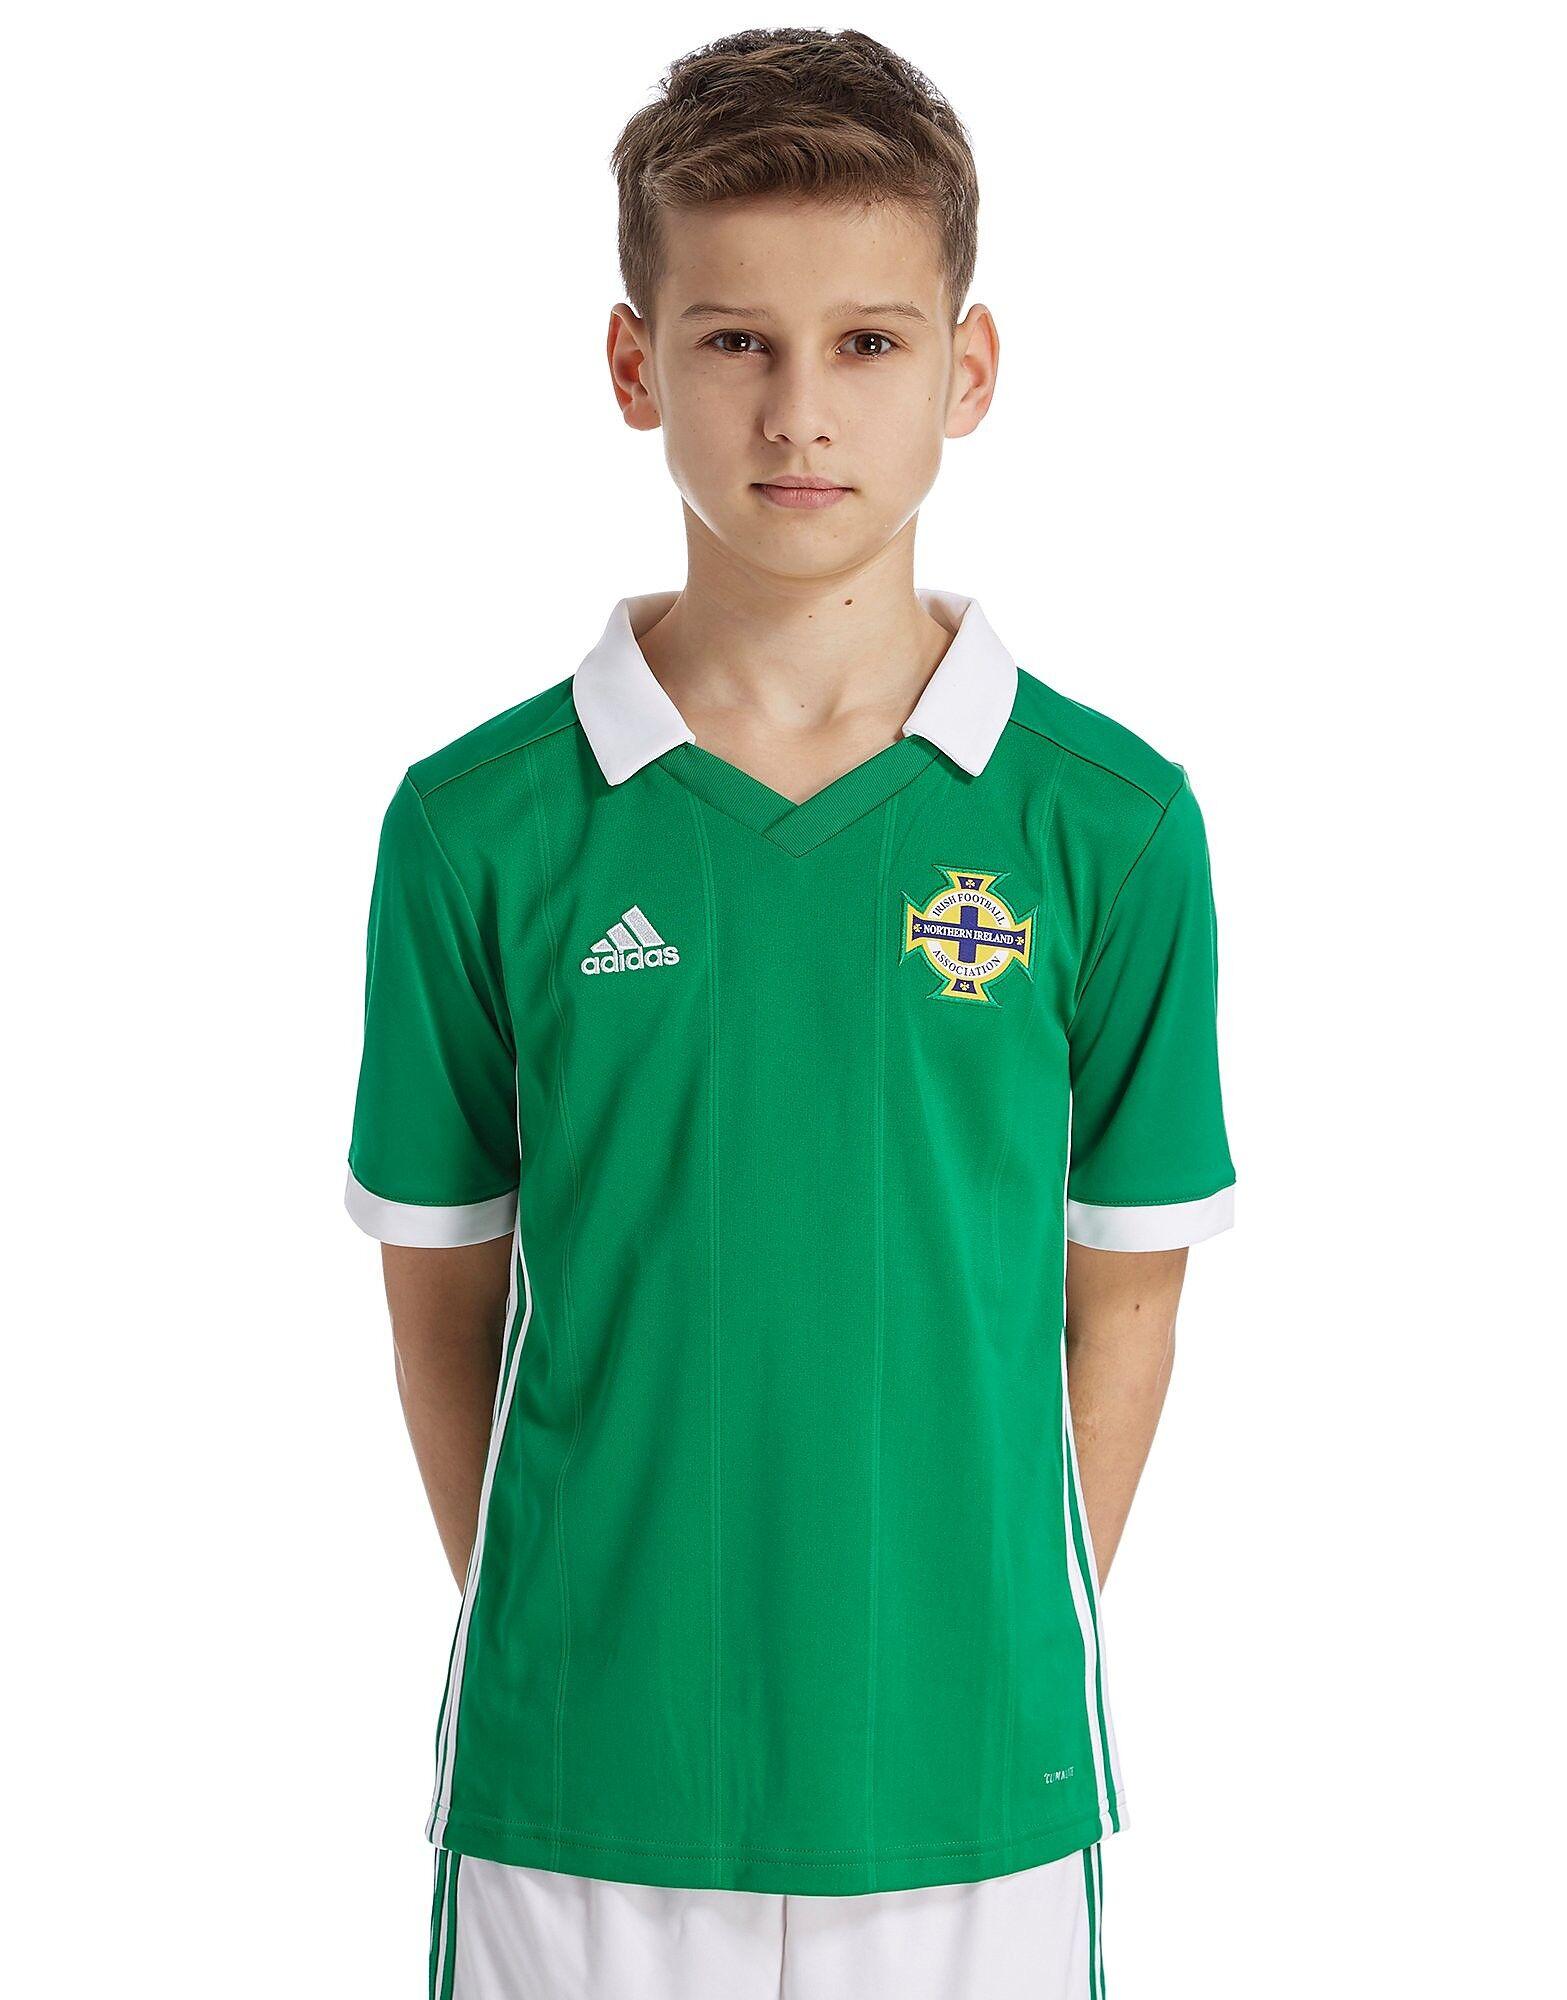 Image of Adidas Northern Ireland 2018/19 Kotipaita Juniorit - Kids, Vihreä